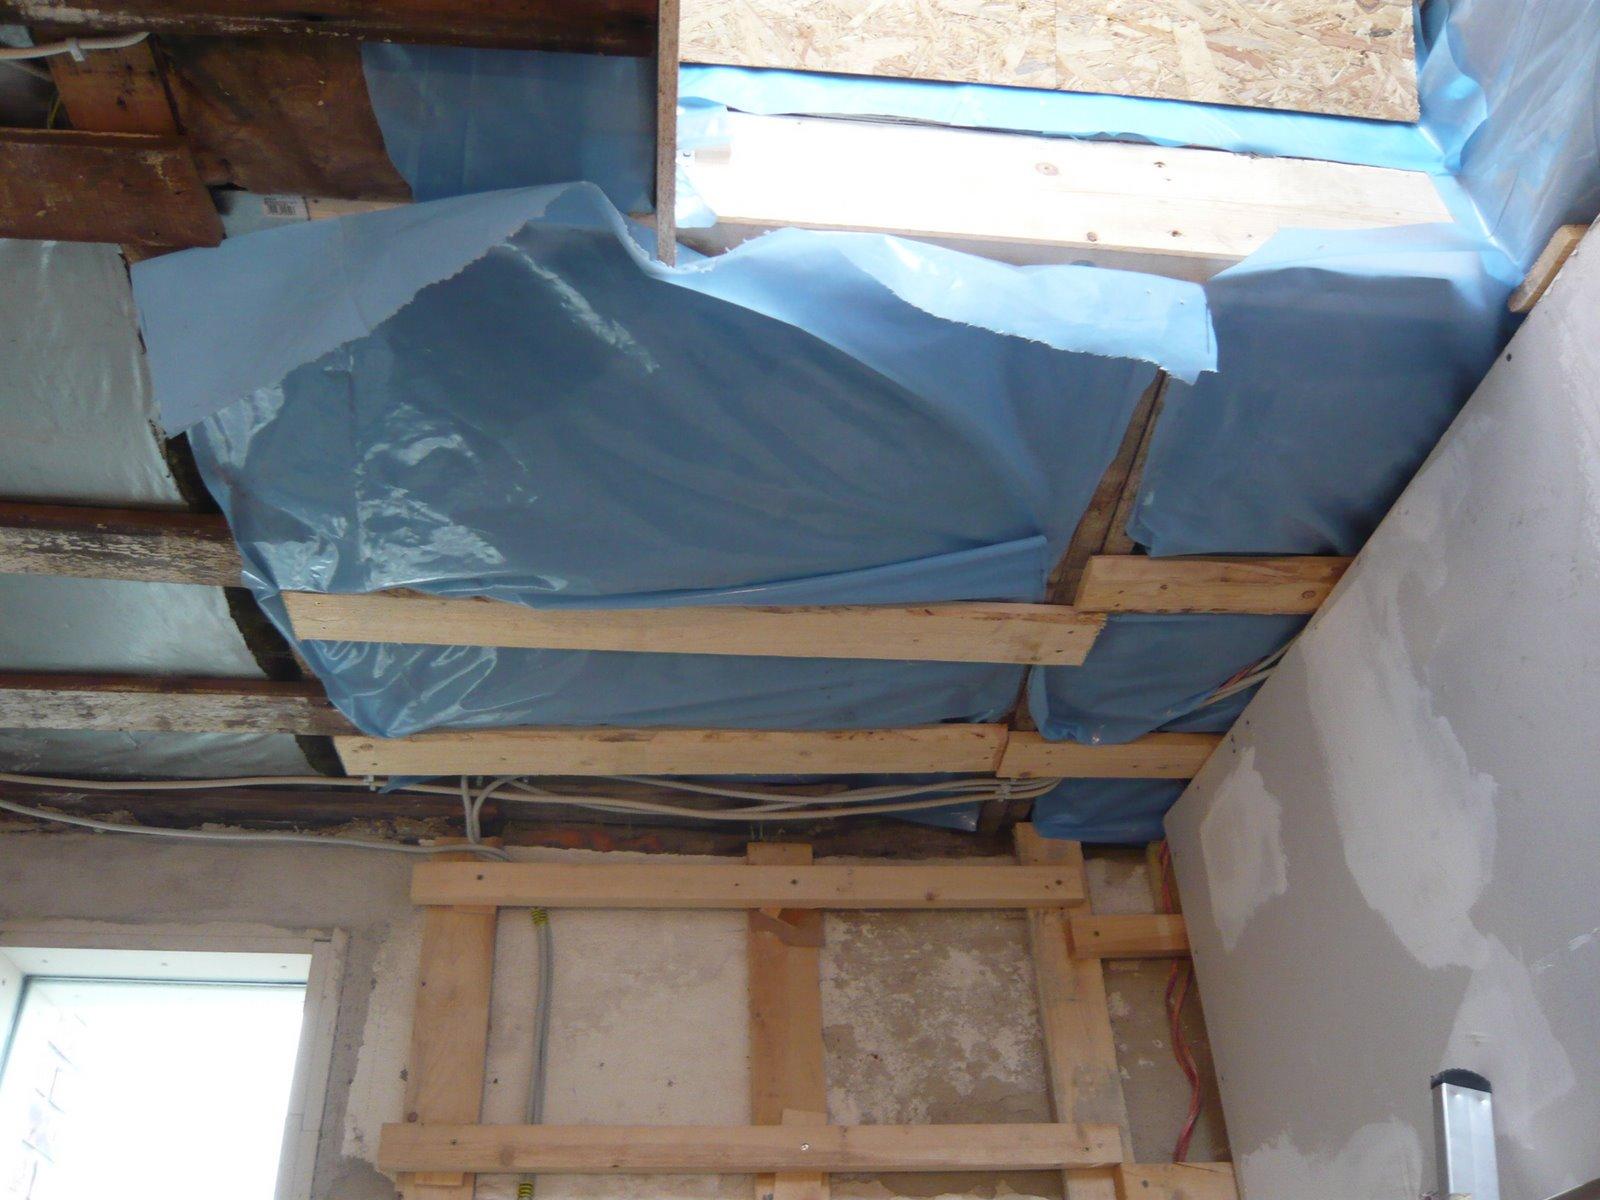 mopsis baublog d mmung in die decke. Black Bedroom Furniture Sets. Home Design Ideas